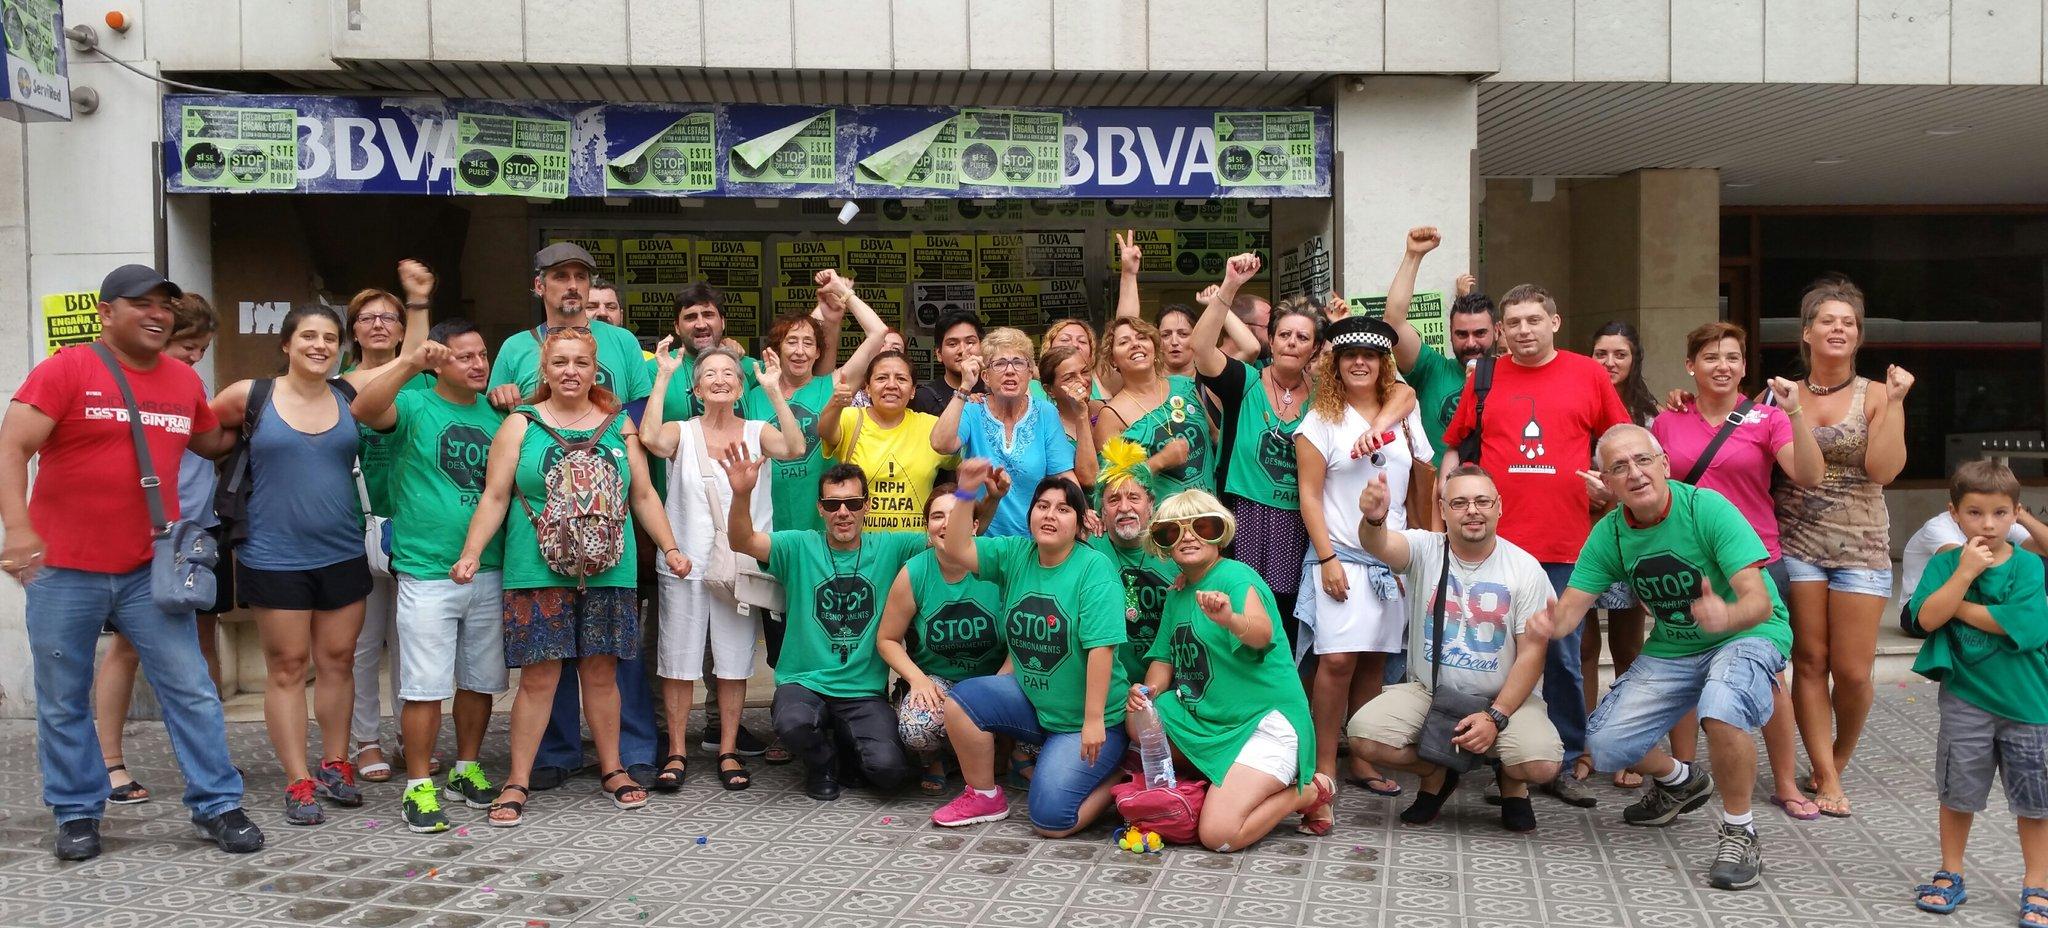 Seguimos la campa a de se alizaci n a bbva pah barcelona for Bbva oficines barcelona